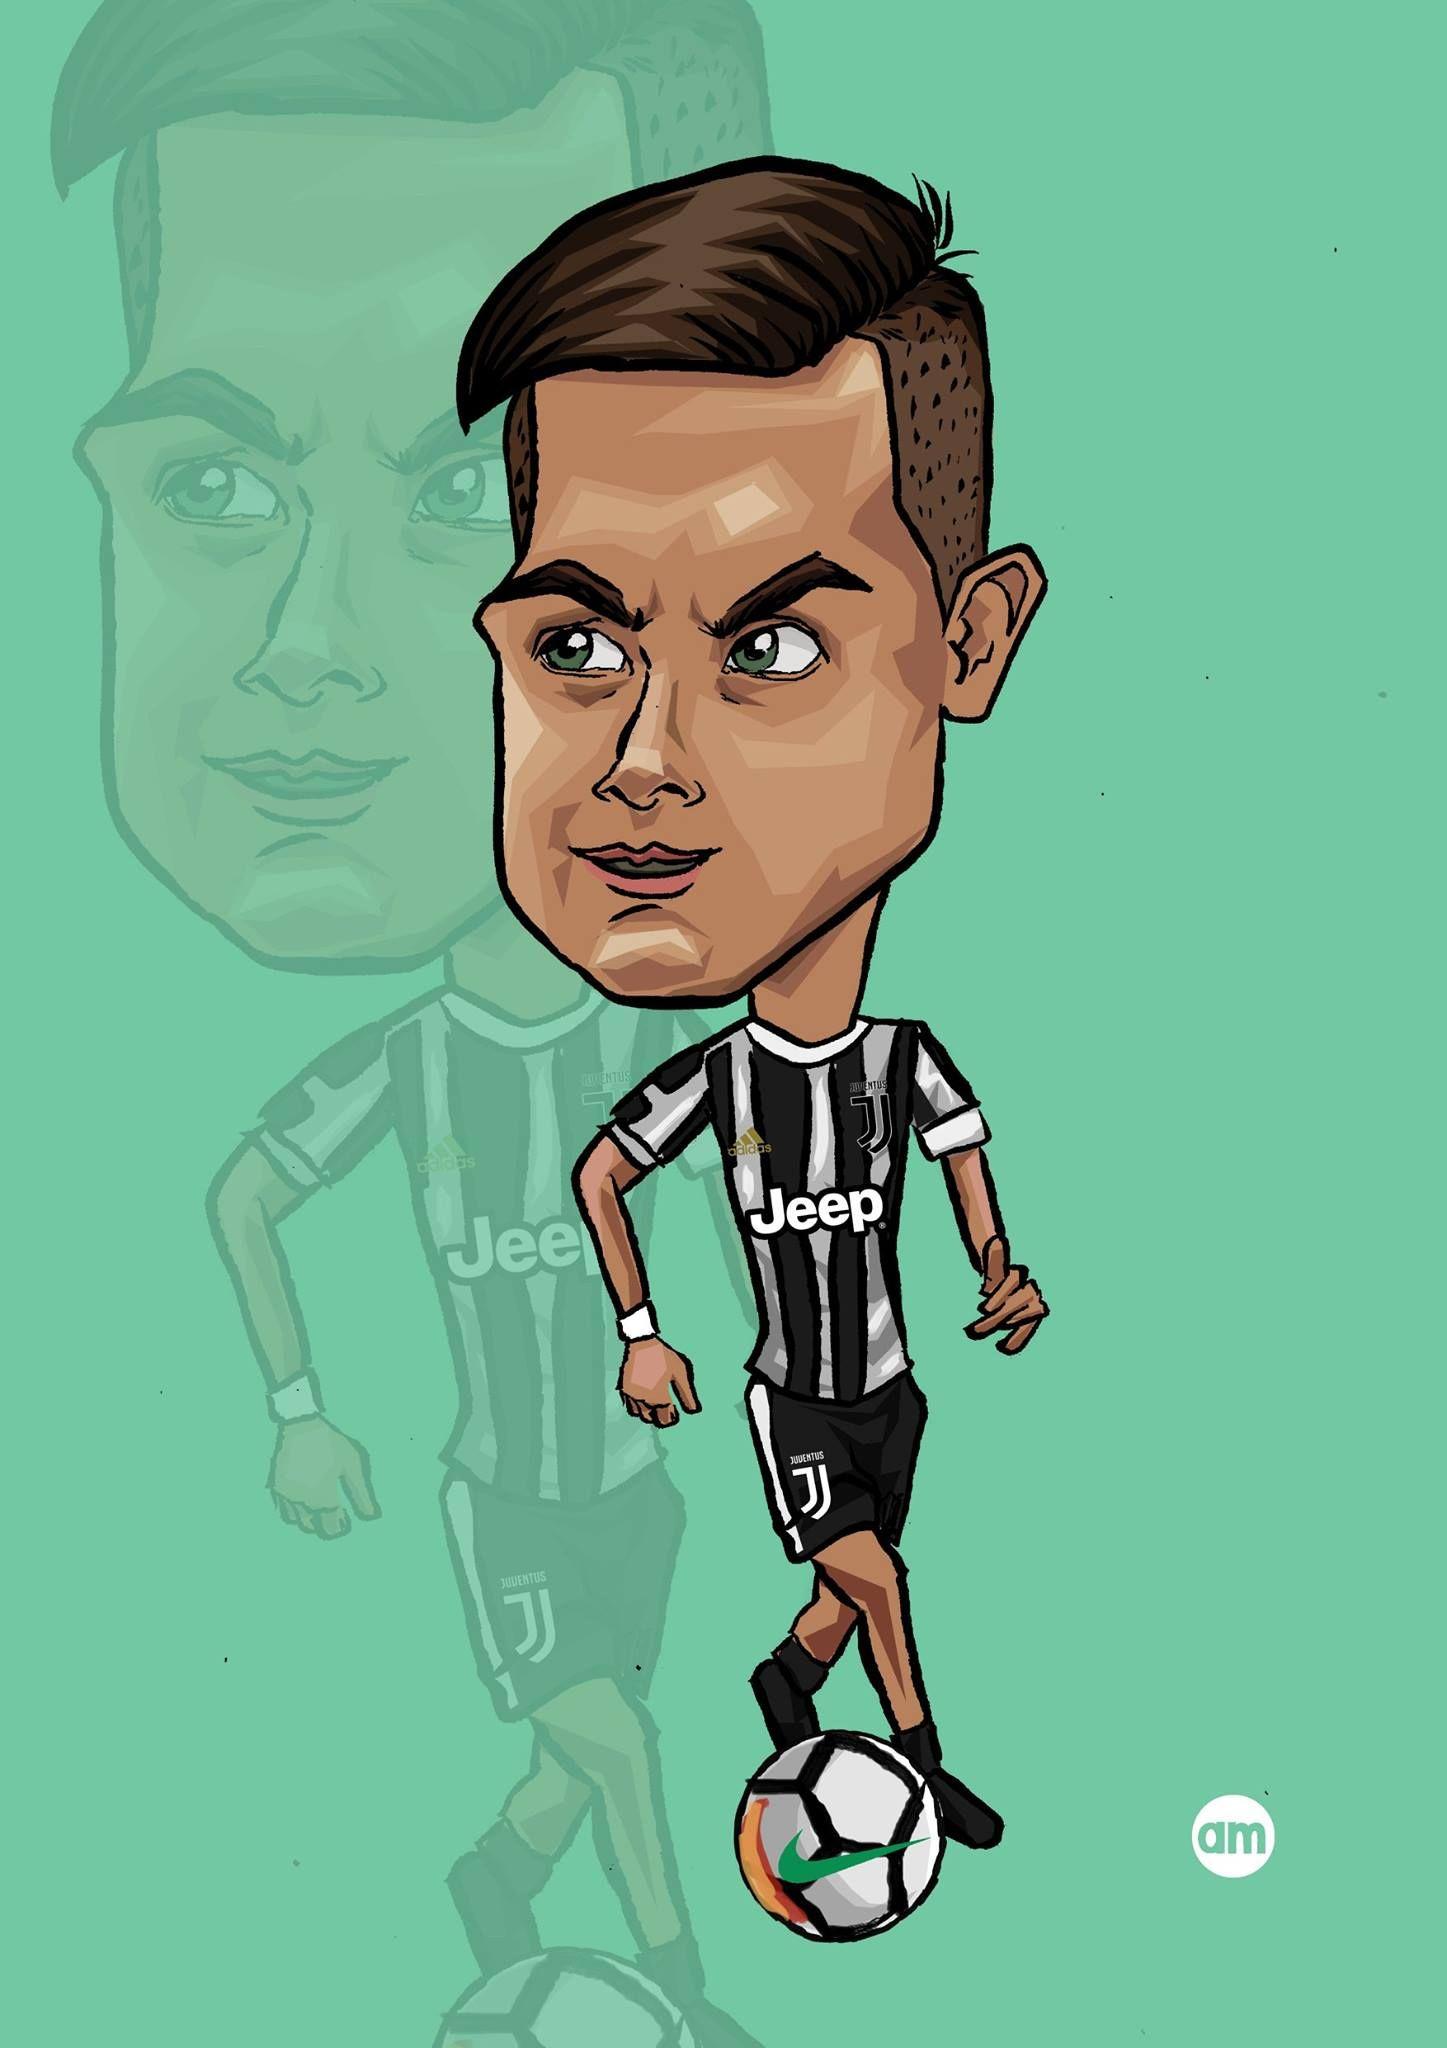 Dybala Juventus Caricature Illustration Disegni Caricature